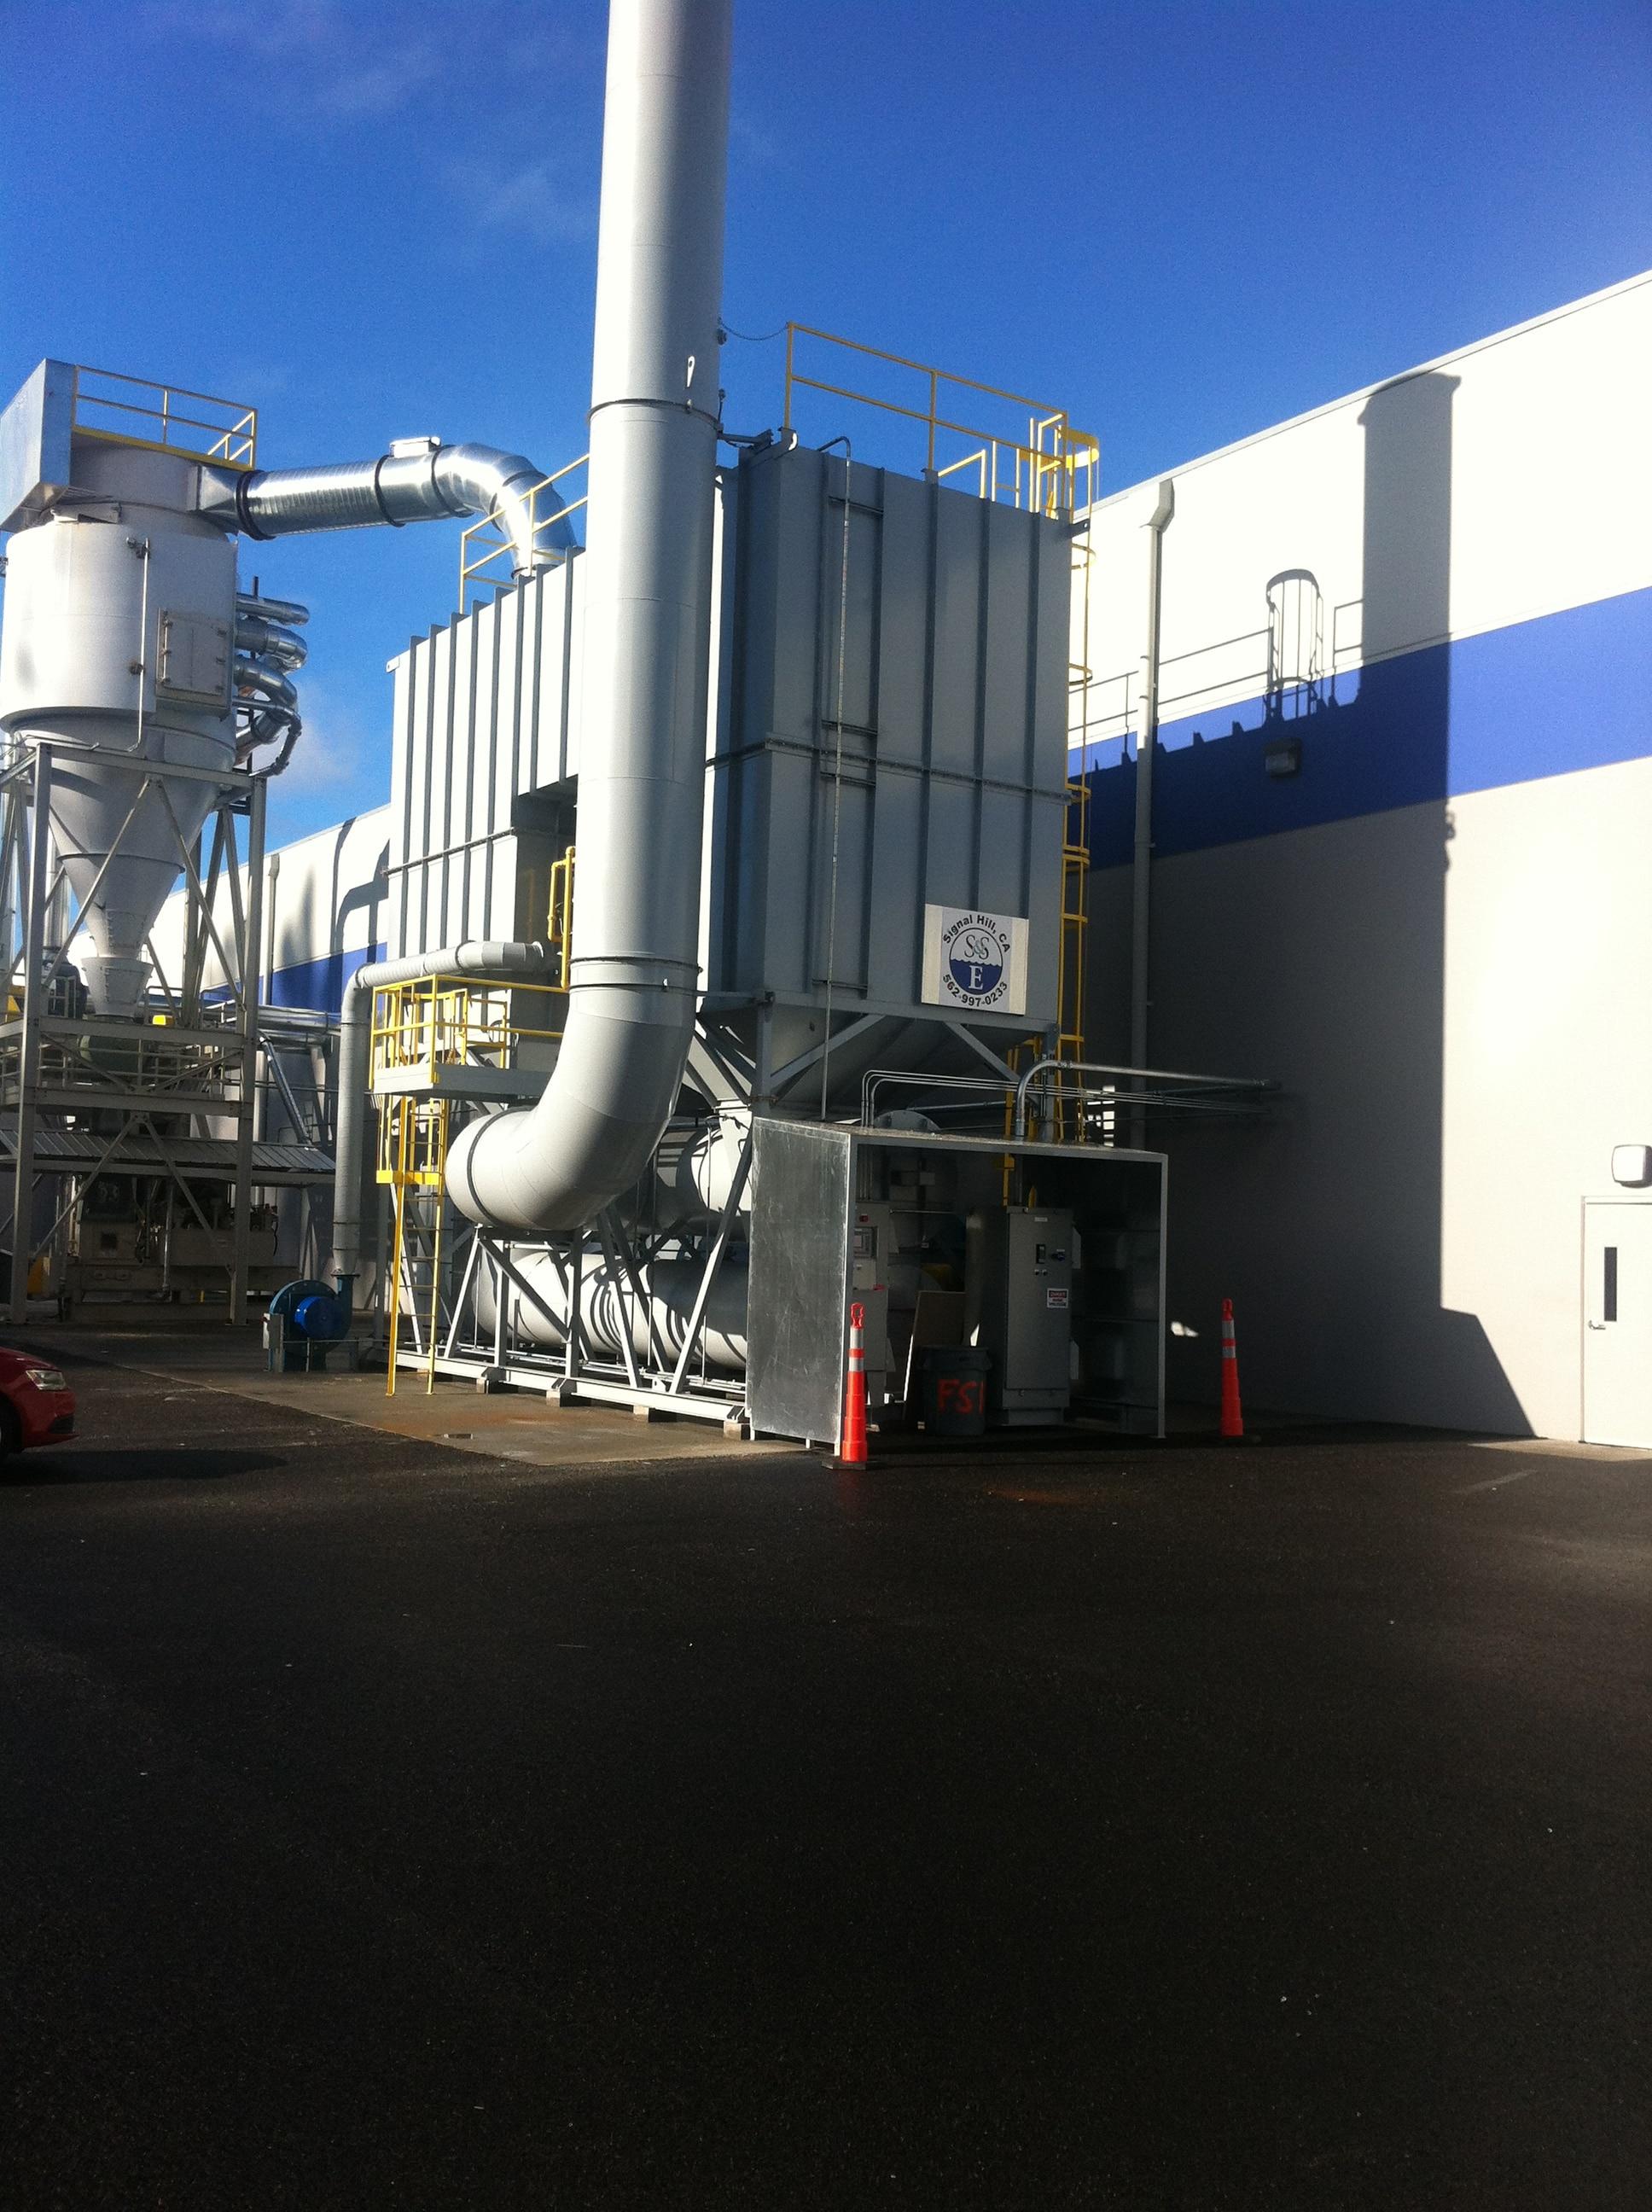 36,000 SCFM Regenerative Thermal Oxidizer